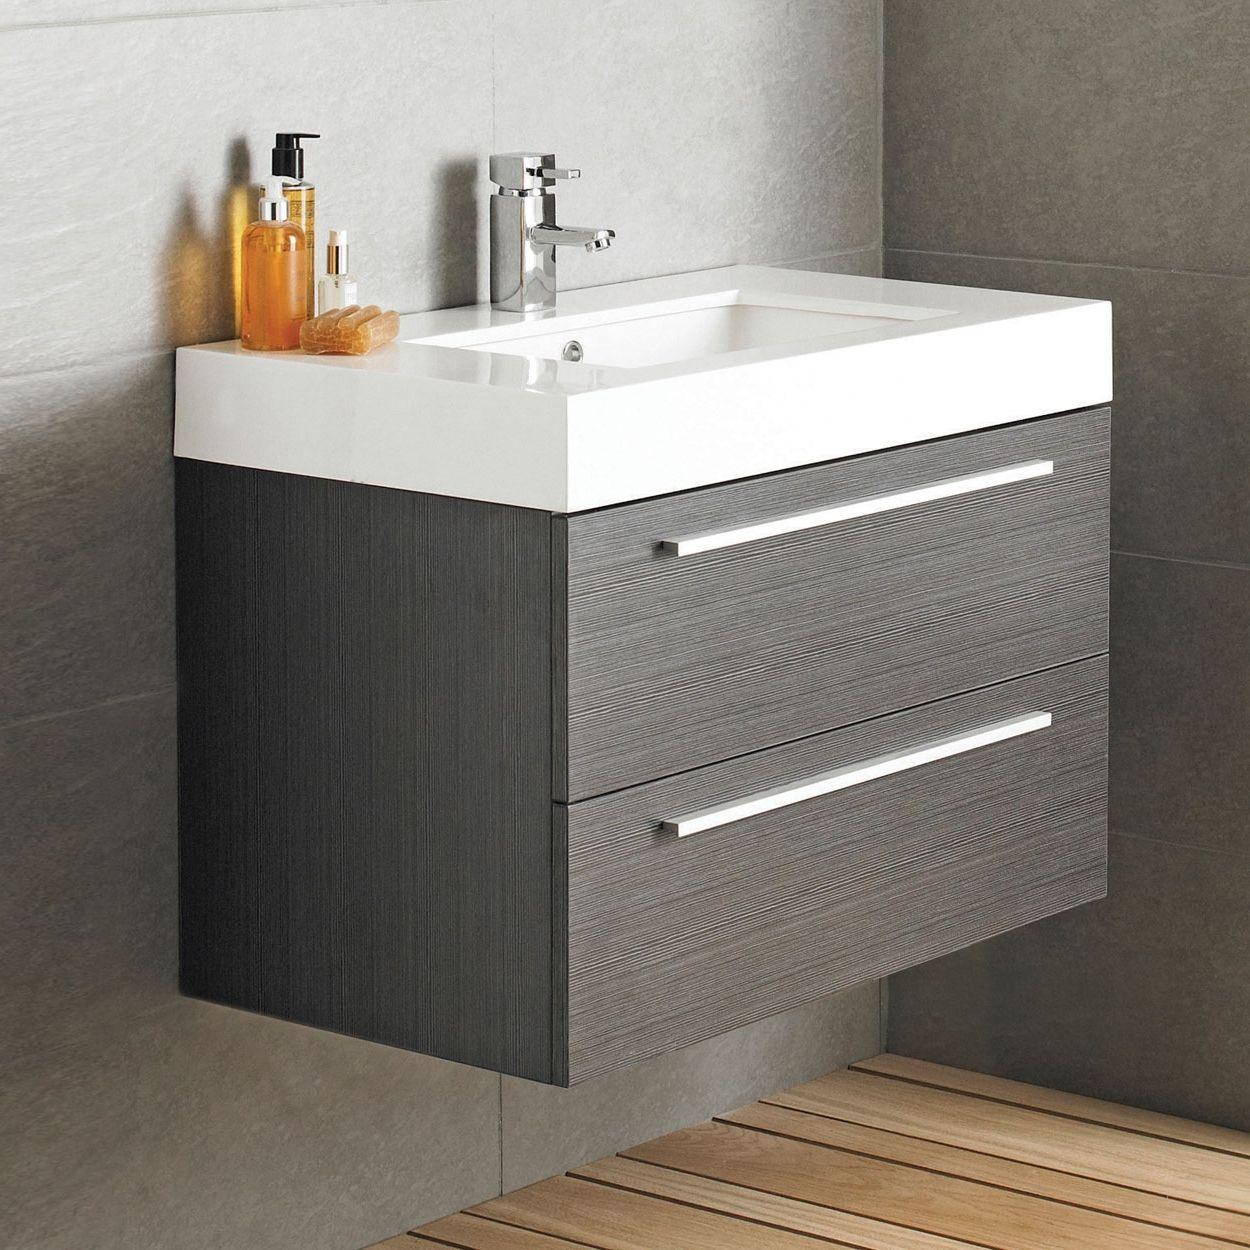 Stupendous Bathroom Sink Units Homebase Stribal Com Design Interior Home Interior And Landscaping Ologienasavecom